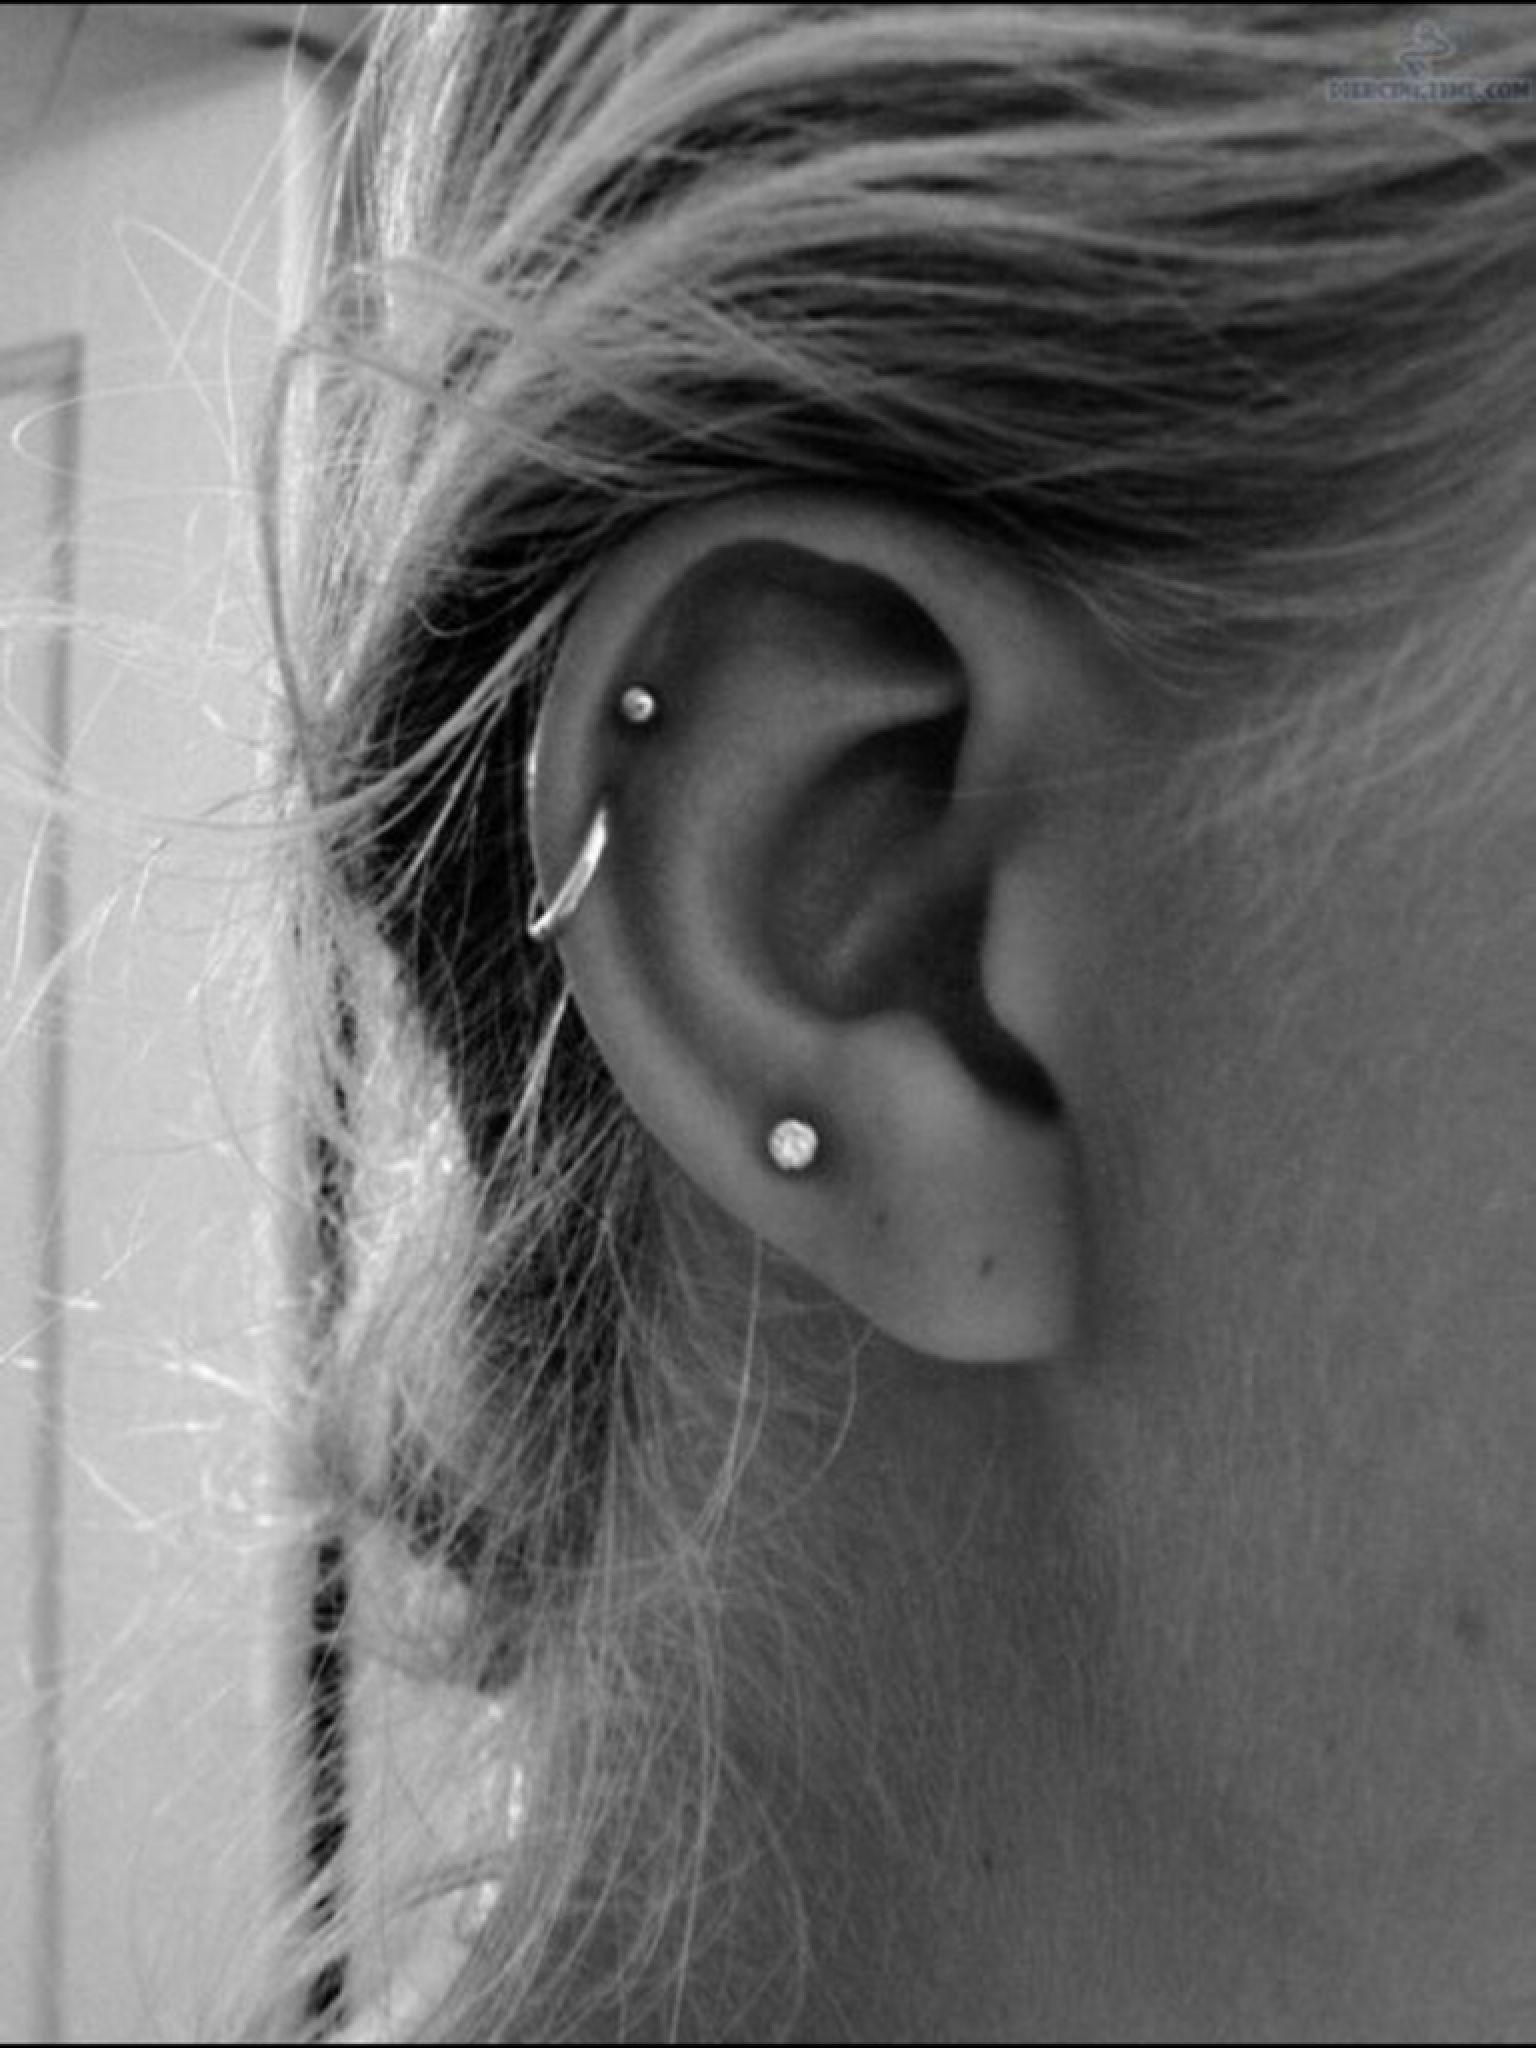 Septum piercing vs nose piercing  share Image  Tattoos u Piercings  Pinterest  Piercings Piercing